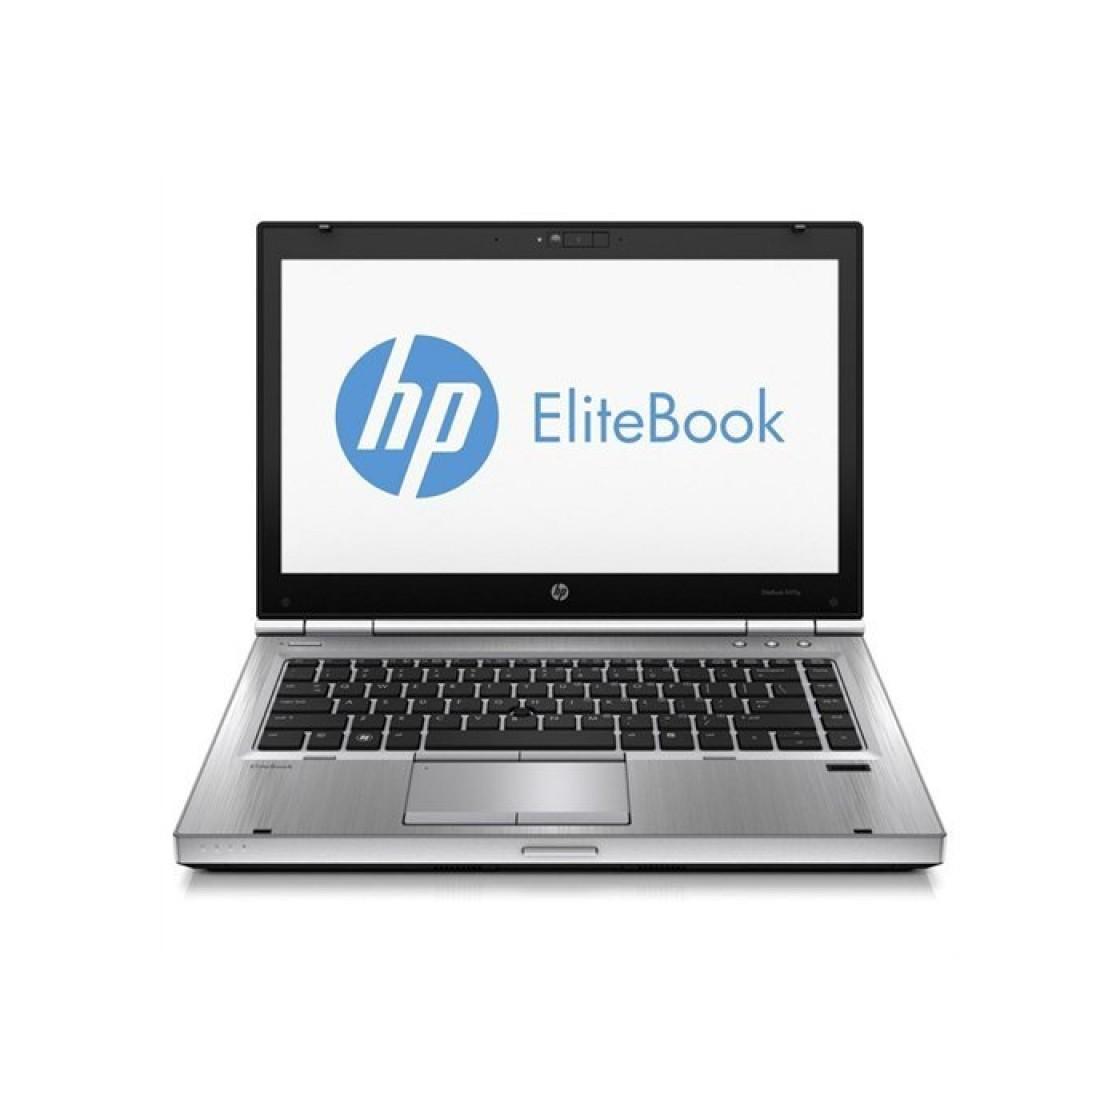 Hp EliteBook 8470P 14-inch (2012) - Core i5-3210M - 16GB  - HDD 250 GB QWERTY - English (US)